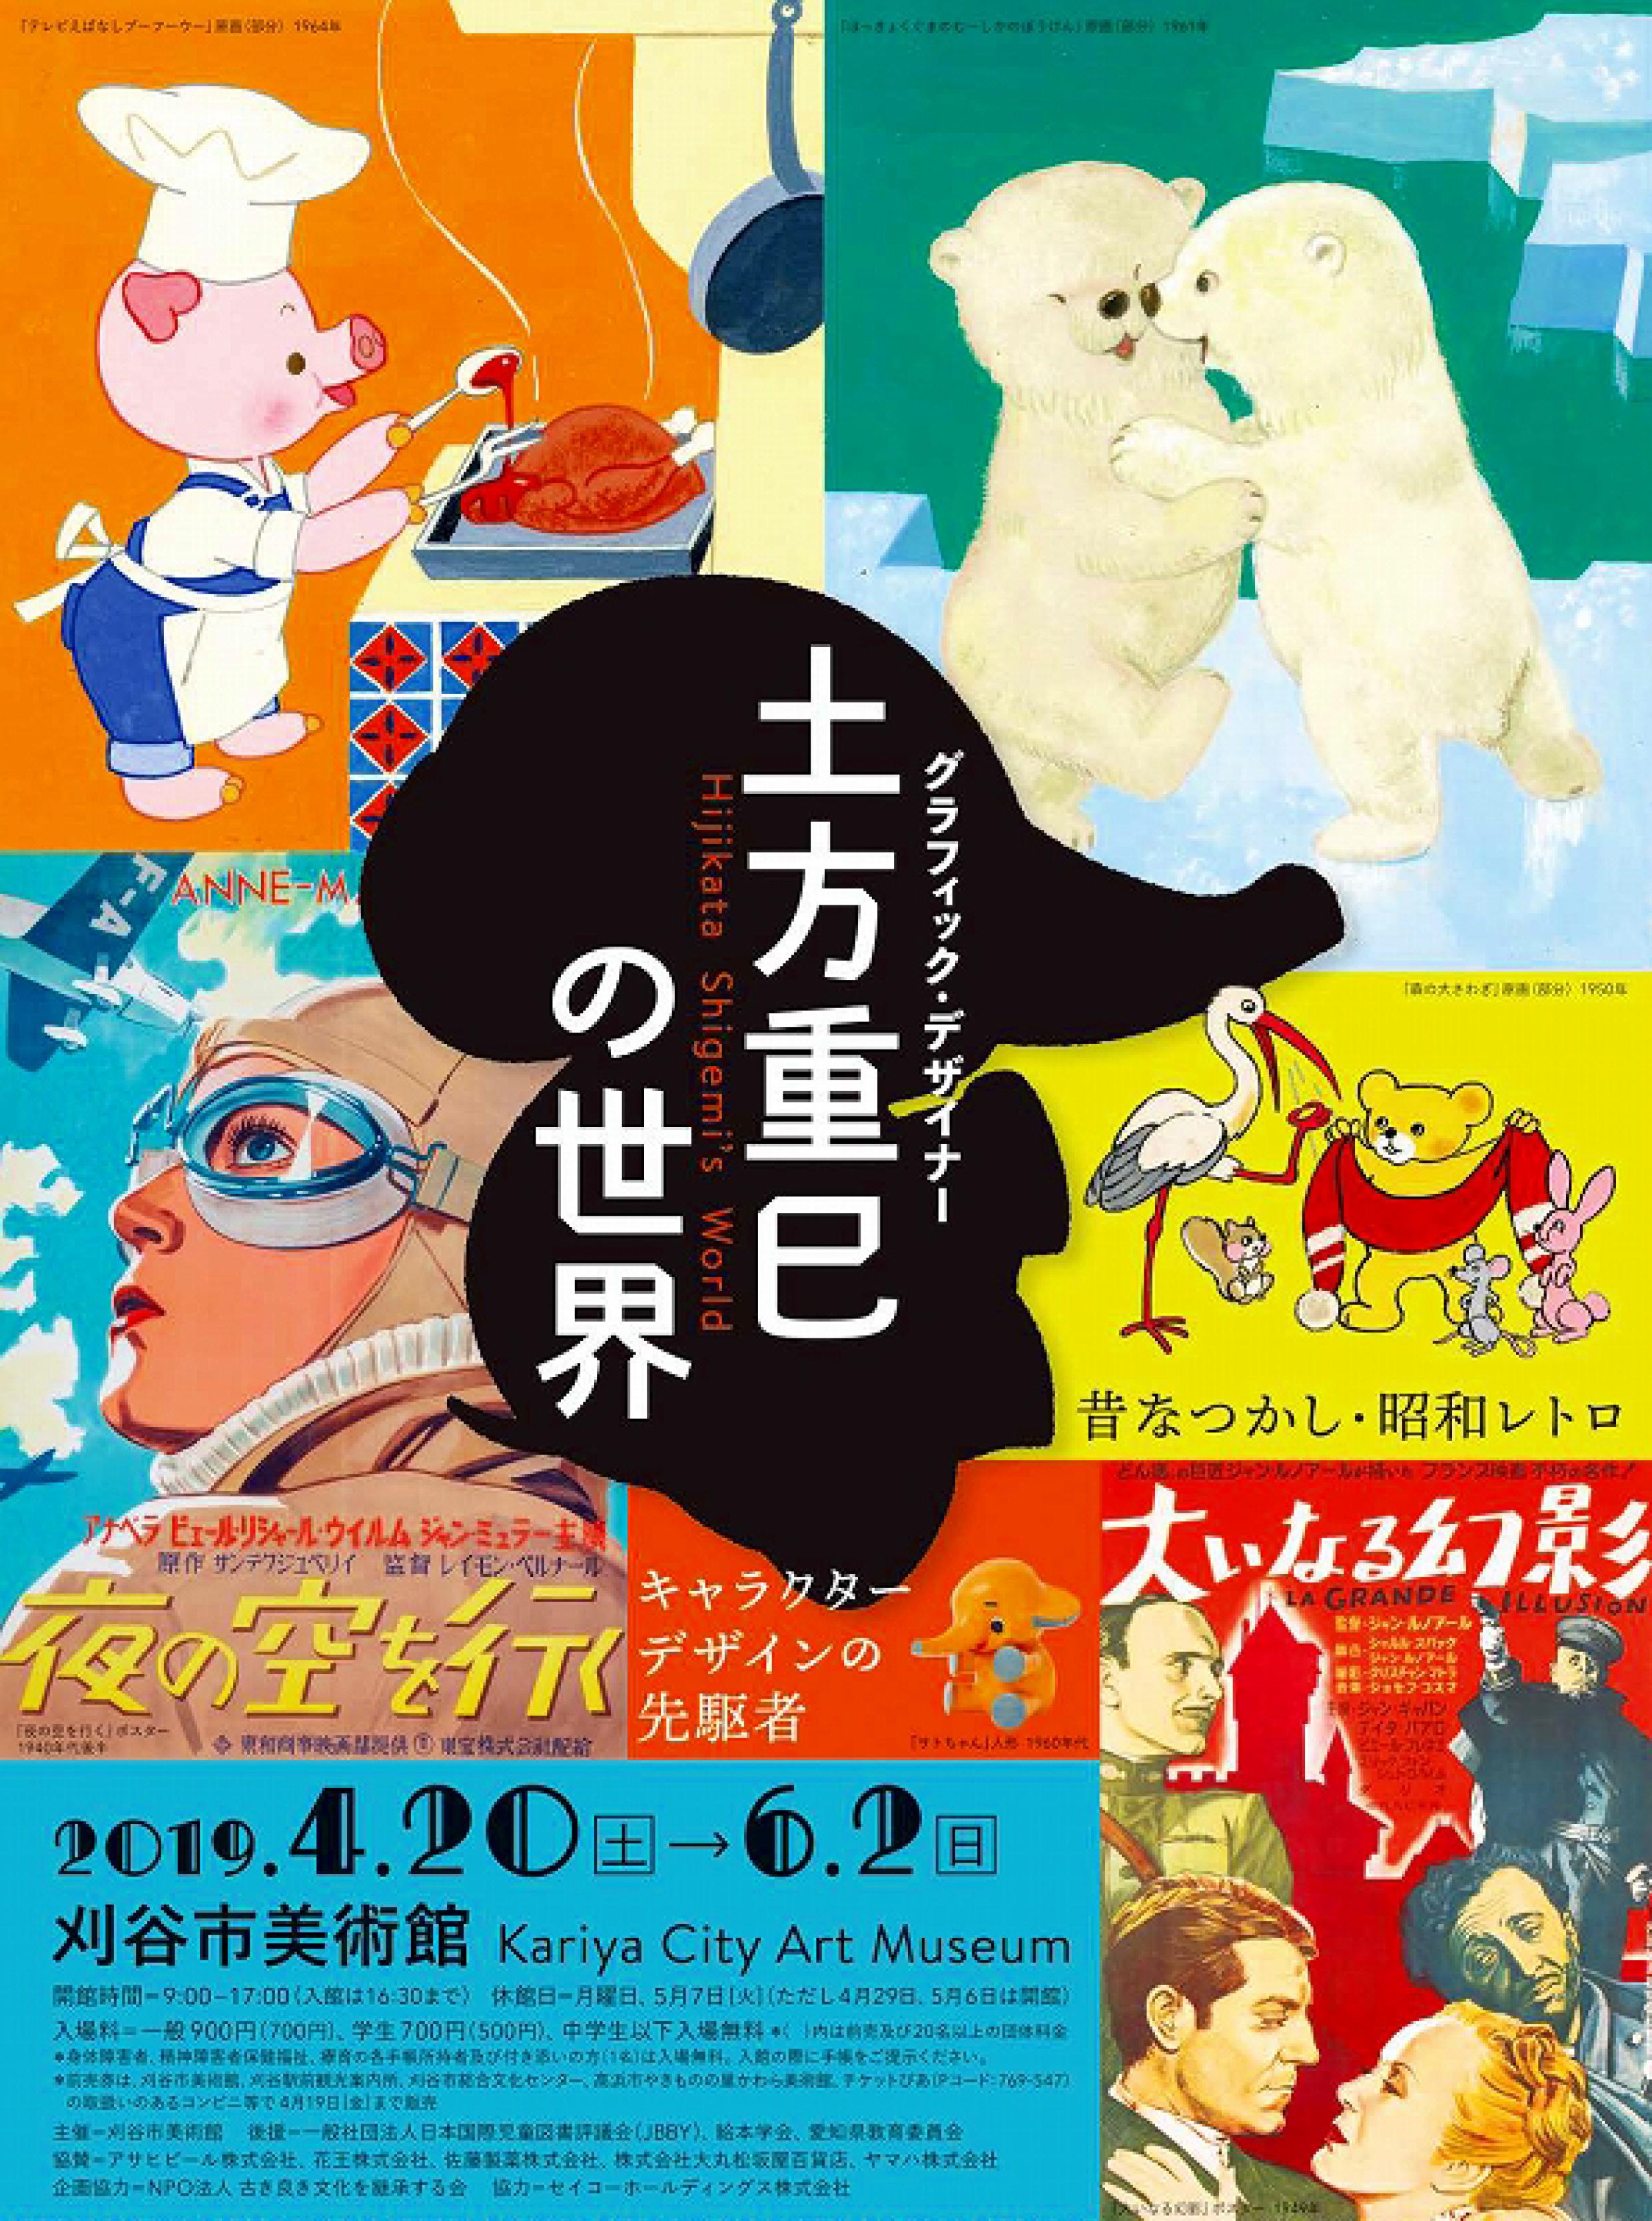 hizikatachirashi-1.jpg